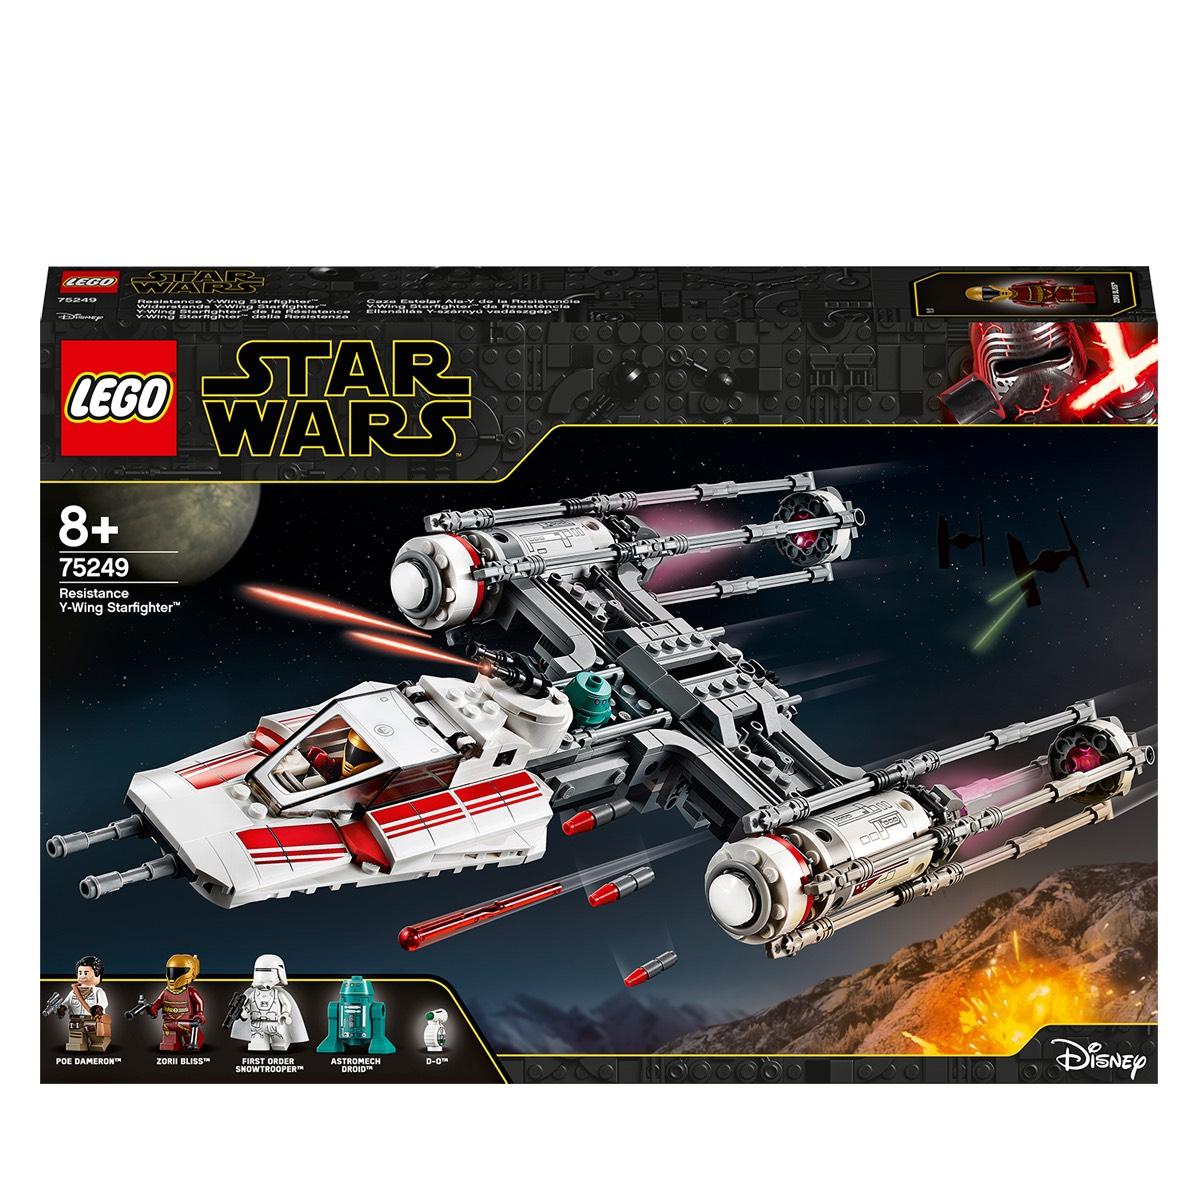 LEGO 75249 Star Wars Resistance Y-Wing Starfighter £47.99 @ Amazon